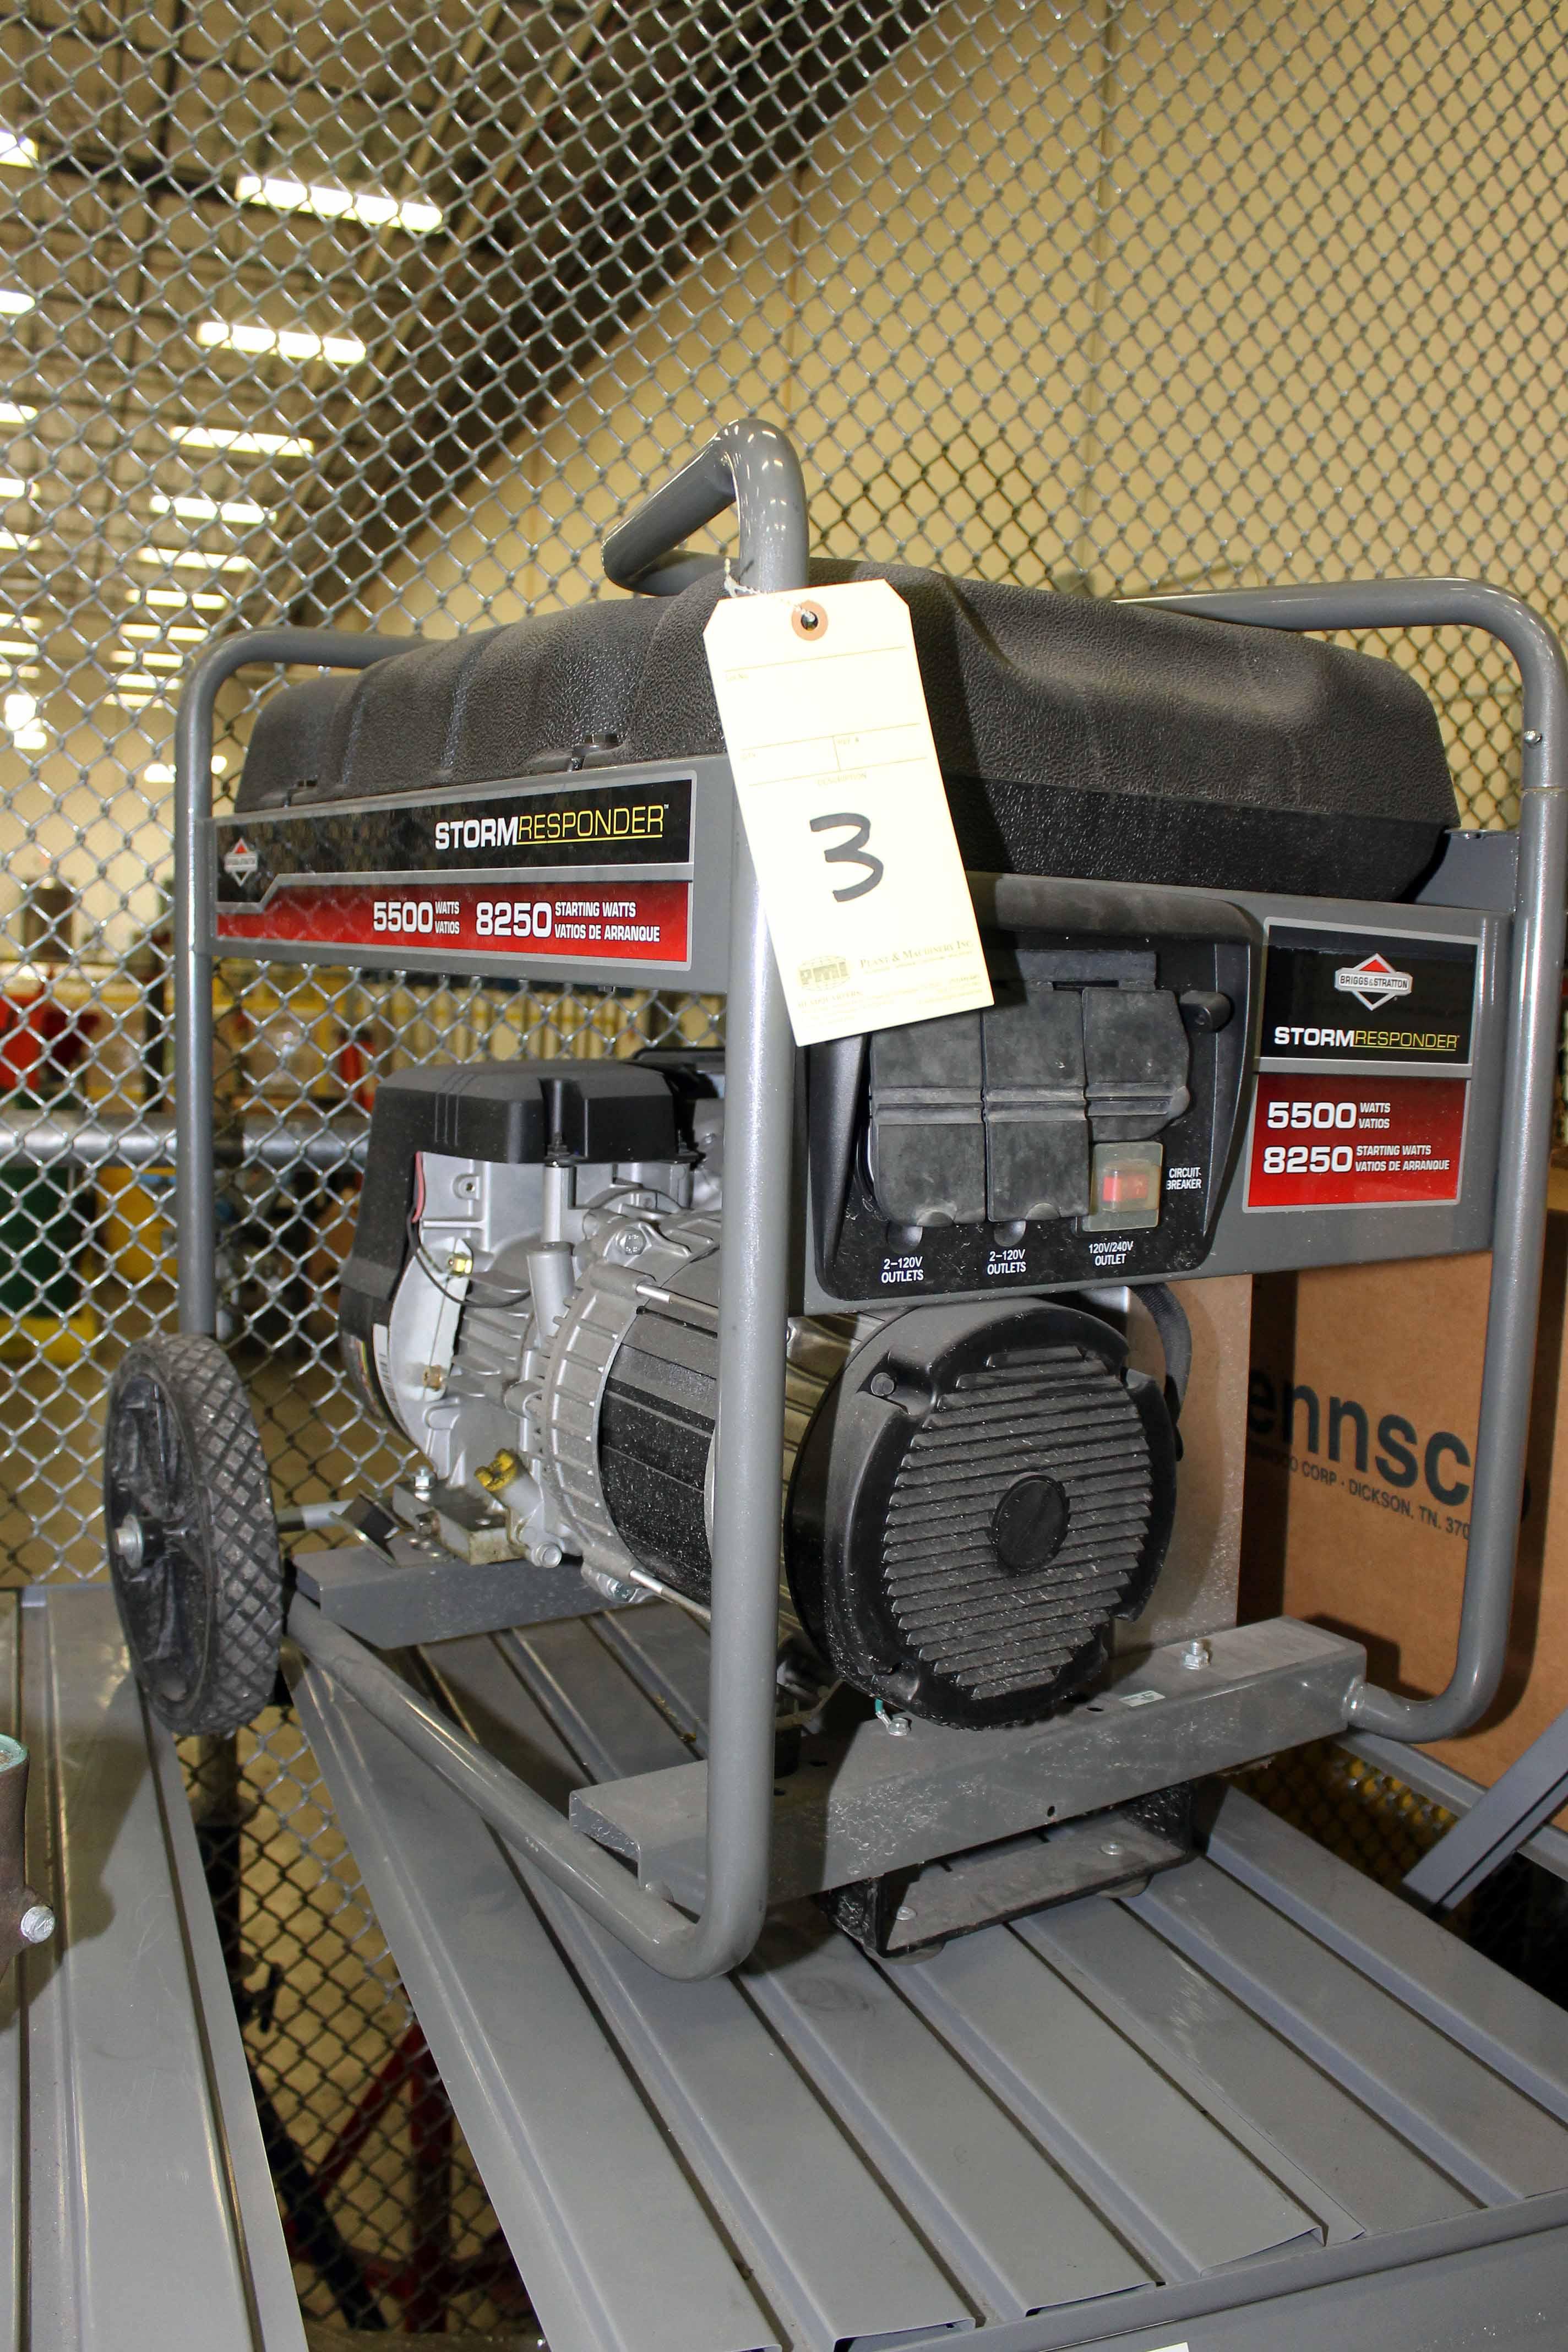 Lot 3 - PORTABLE GENERATOR, STORM RESPONDER, 5,500 watt, gasoline pwrd. (Location 1 - Techway)